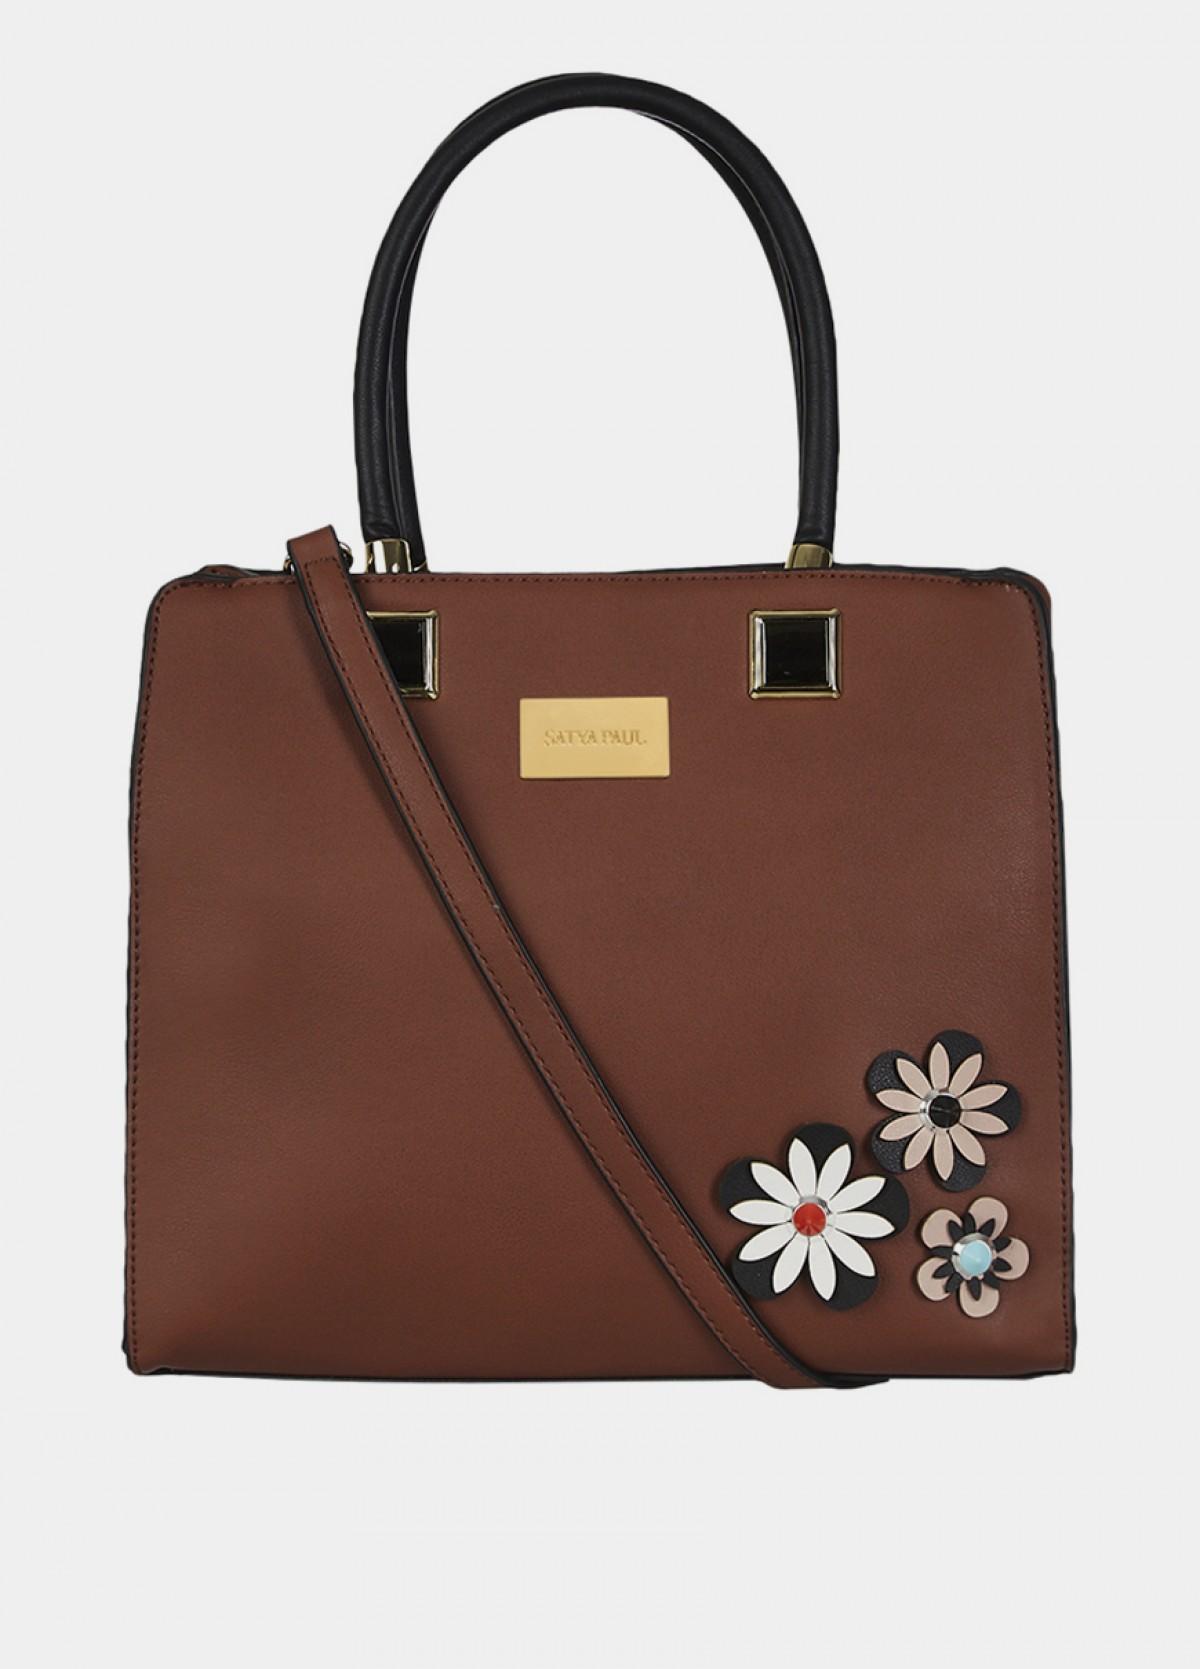 The Classic Shopper Bag